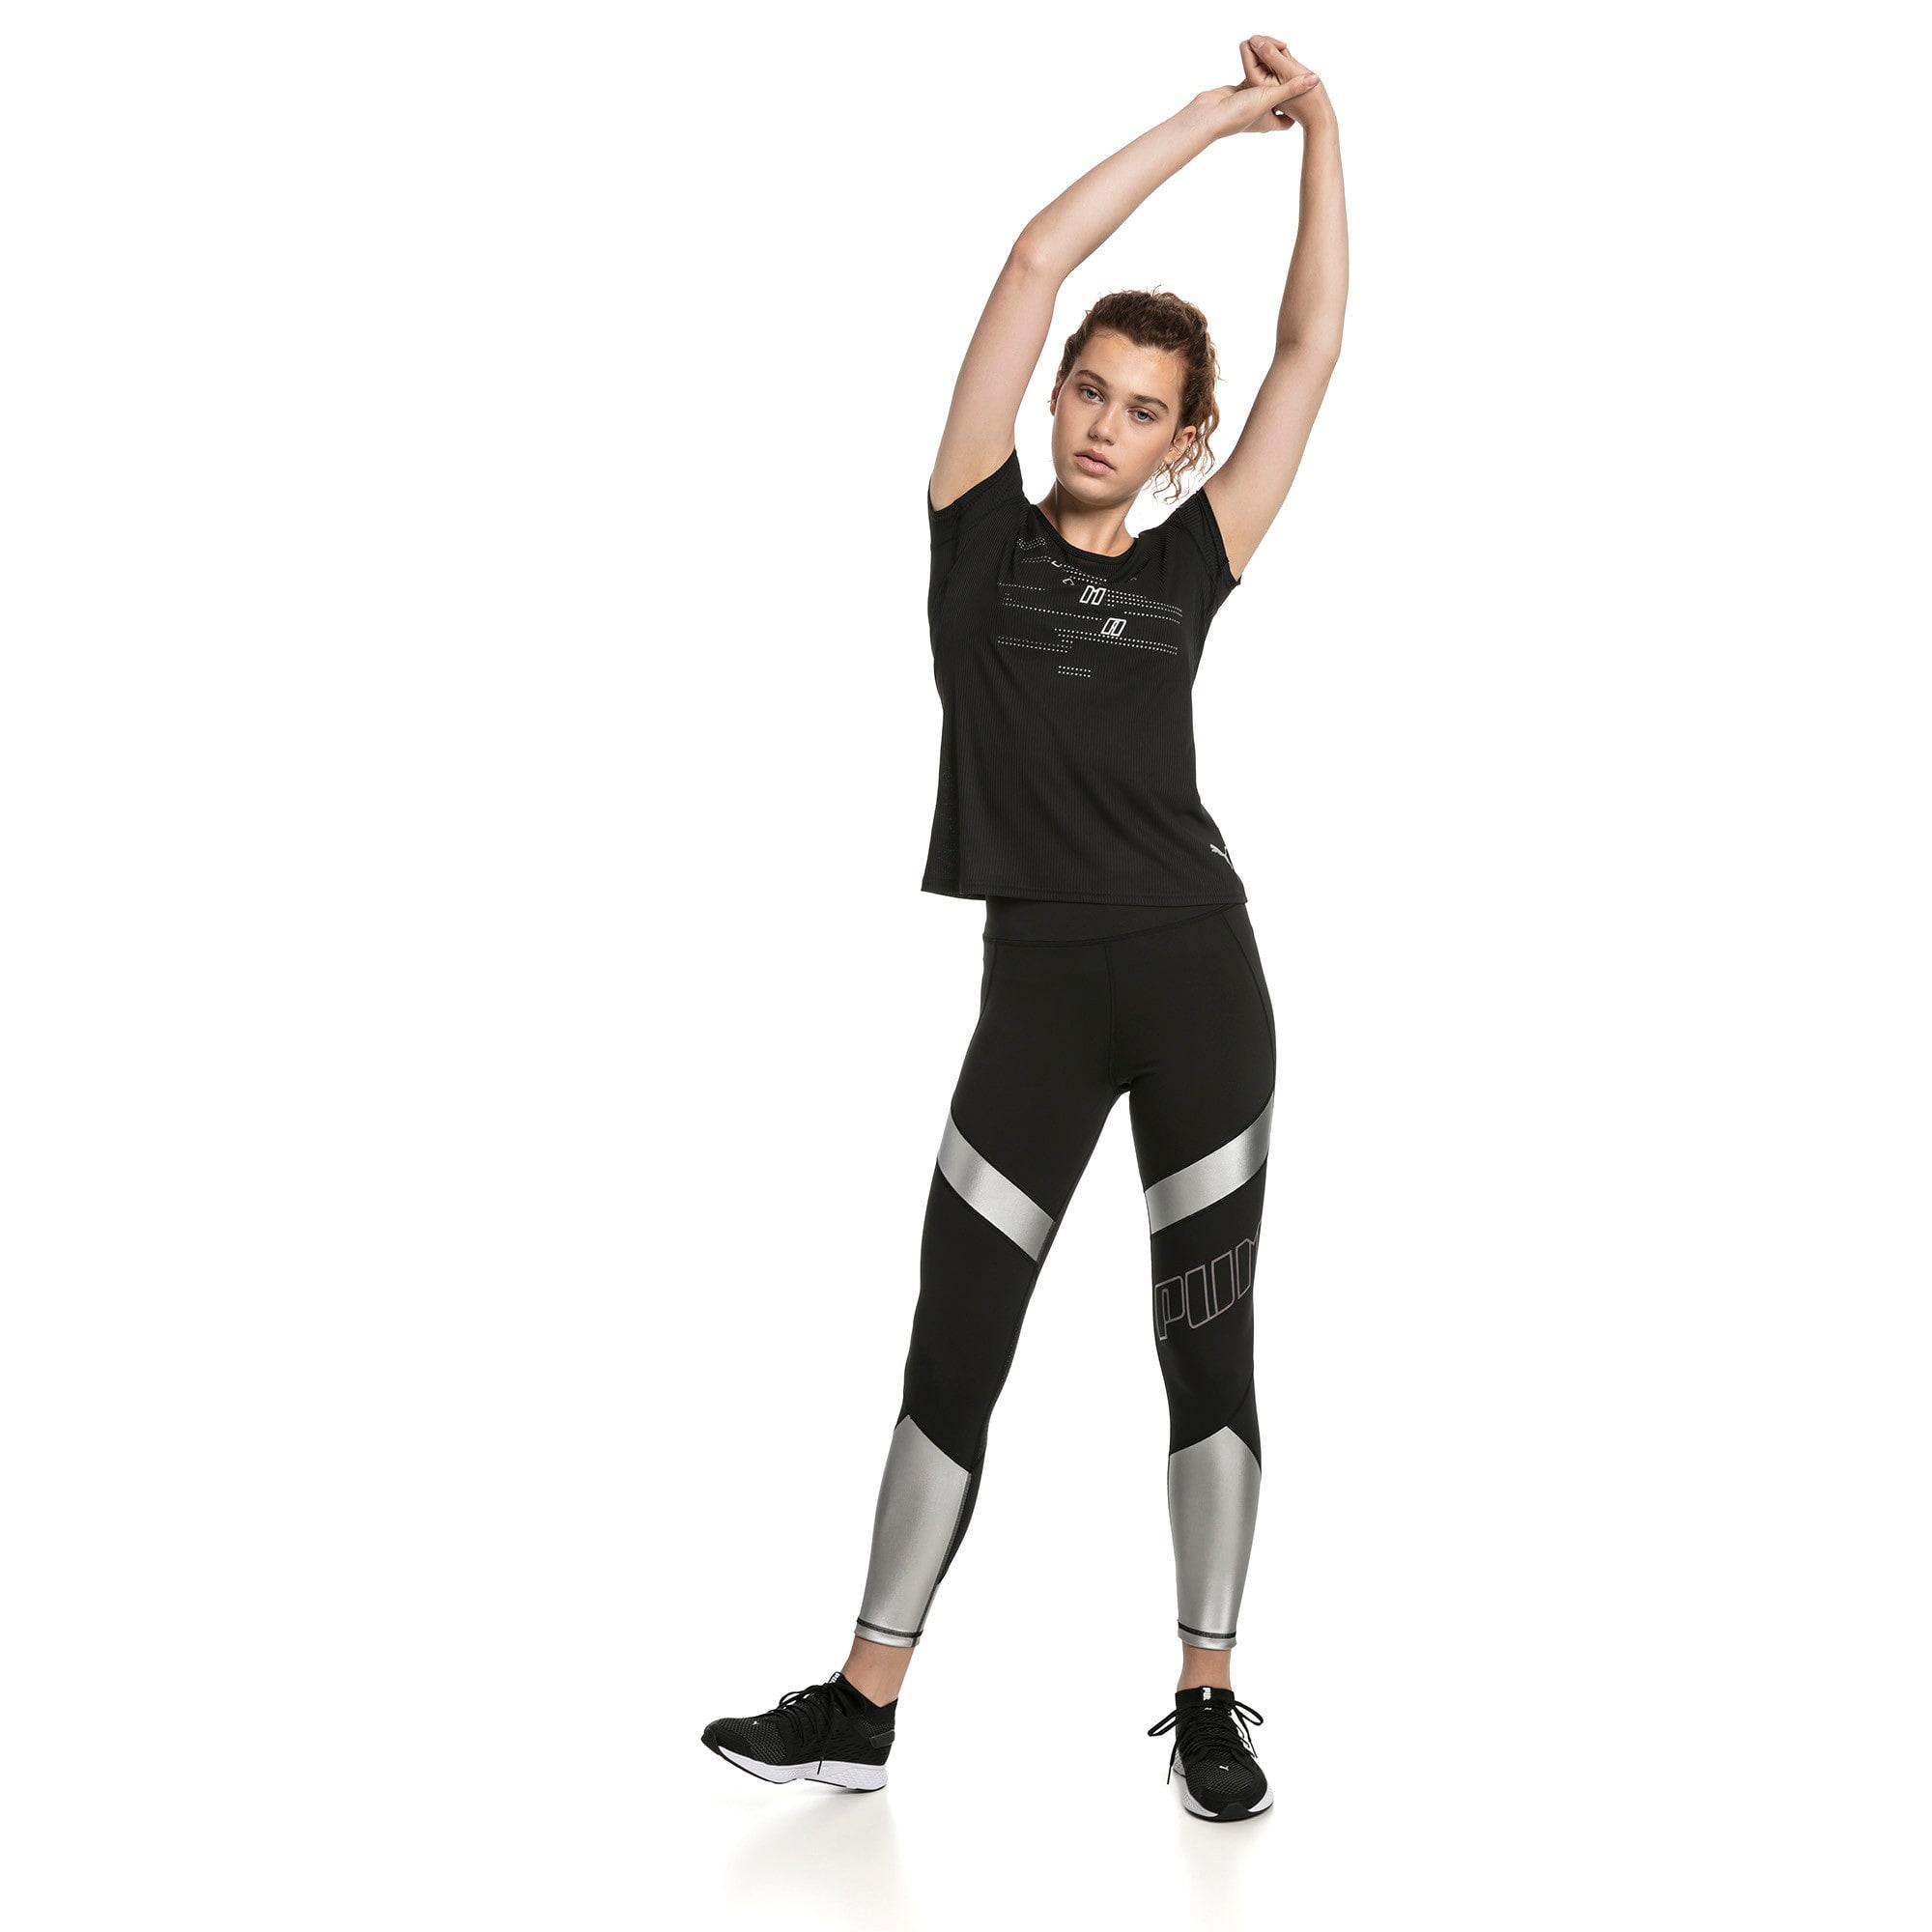 Thumbnail 3 of Elite Speed Women's Leggings, Puma Black-Silver, medium